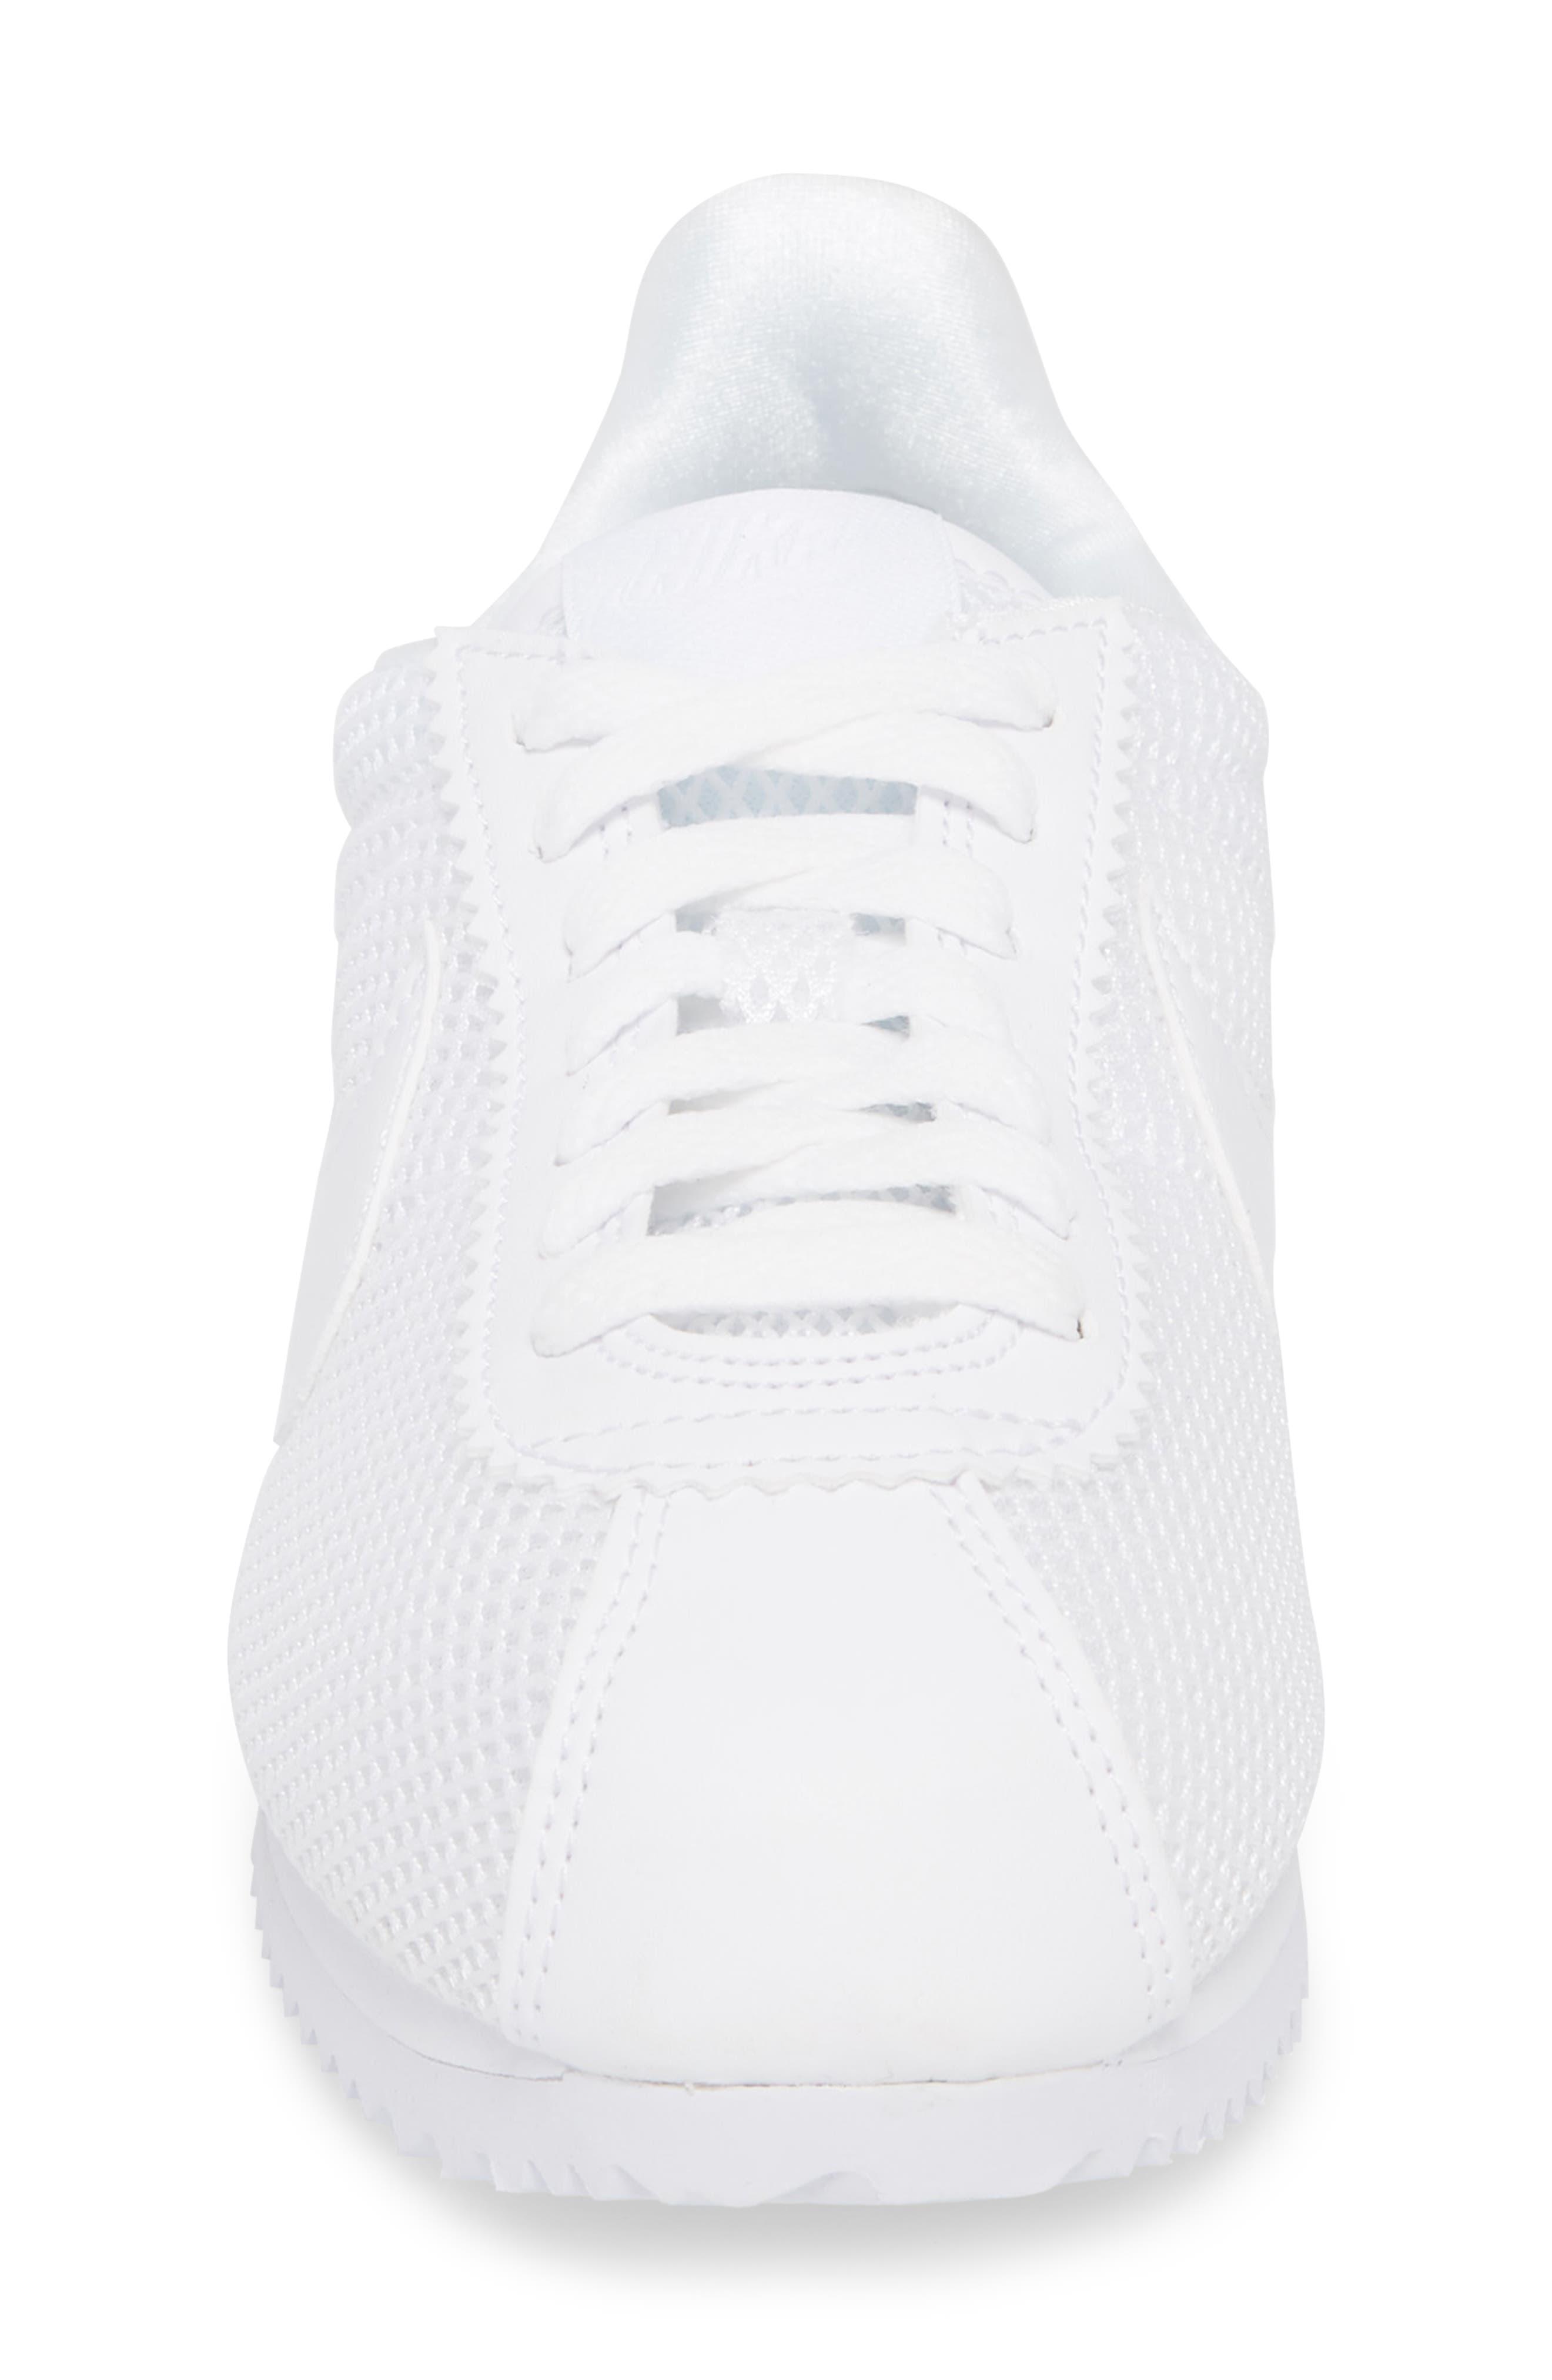 Classic Cortez Premium XLV Sneaker,                             Alternate thumbnail 4, color,                             White/ White